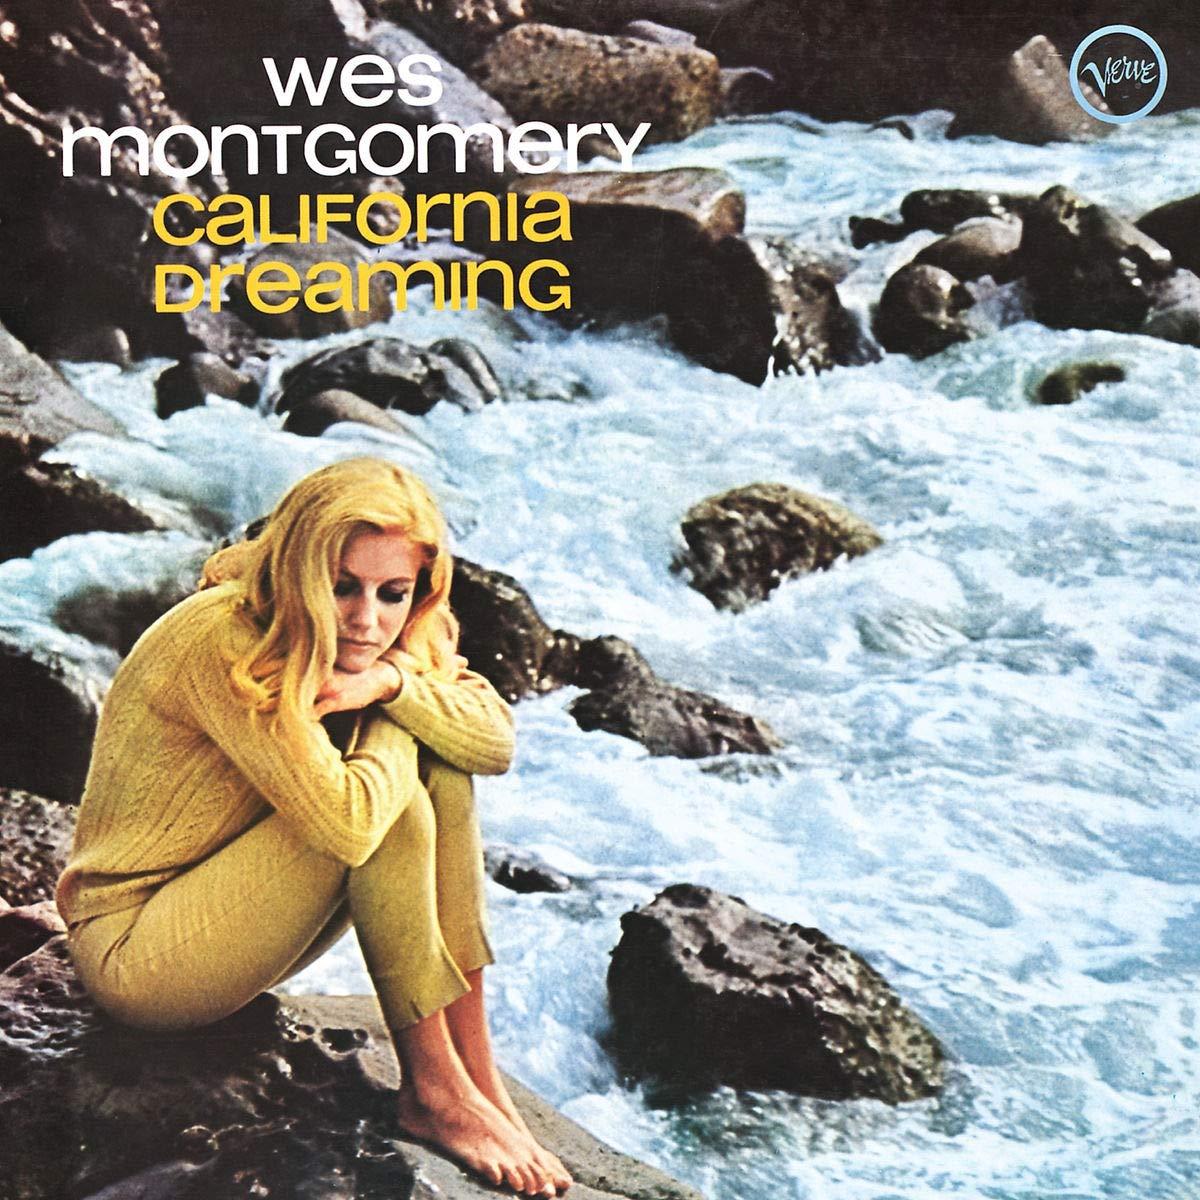 цена Уэс Монтгомери Wes Montgomery. California Dreaming (LP)